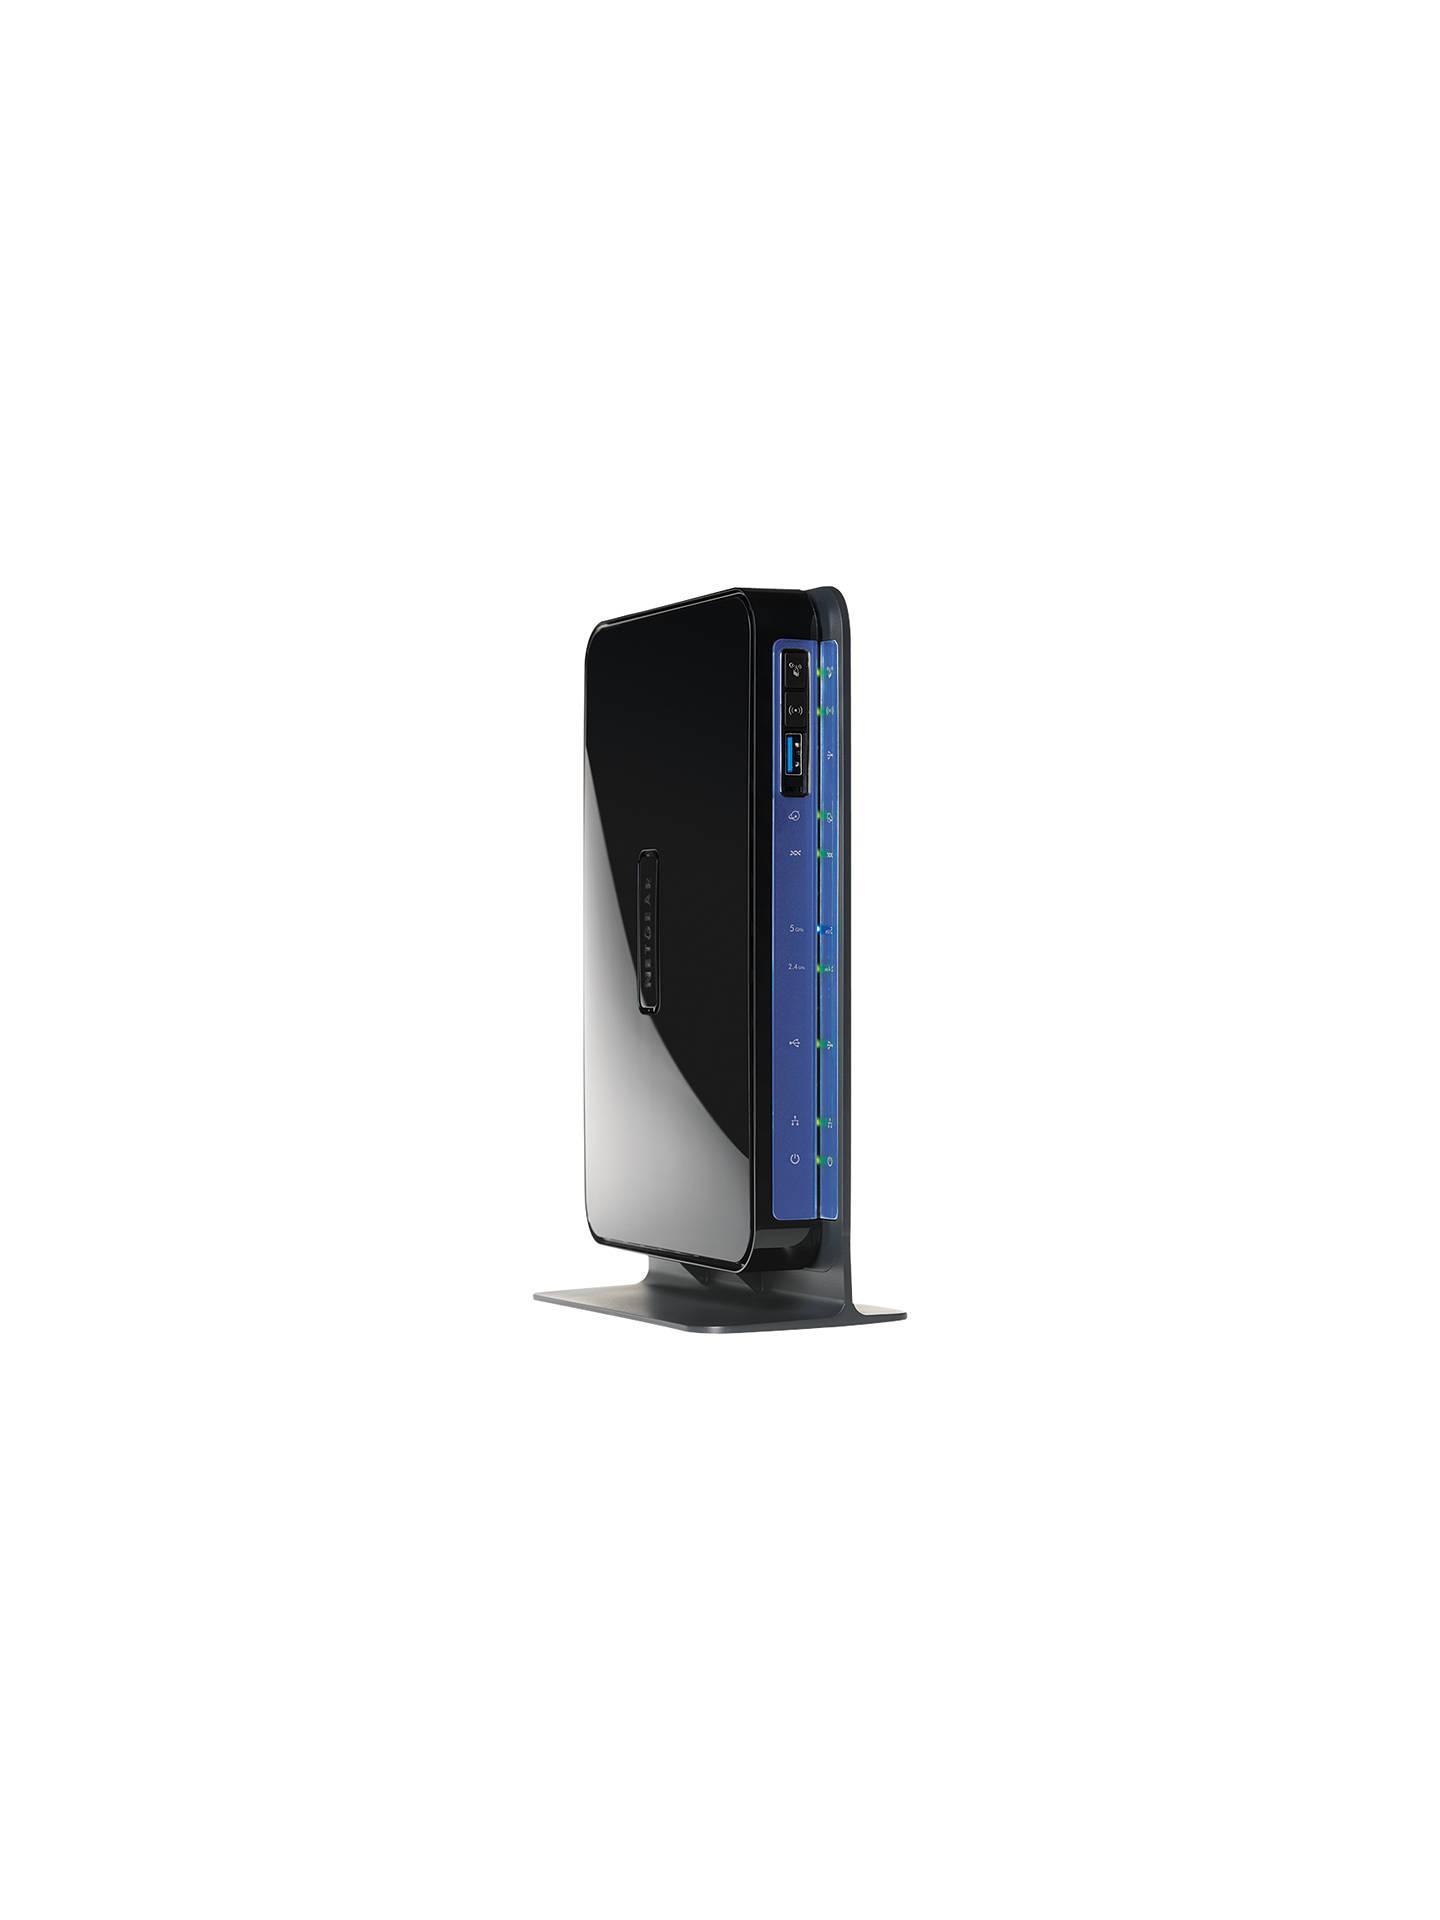 Netgear N600 Wireless Dual Band Gigabit